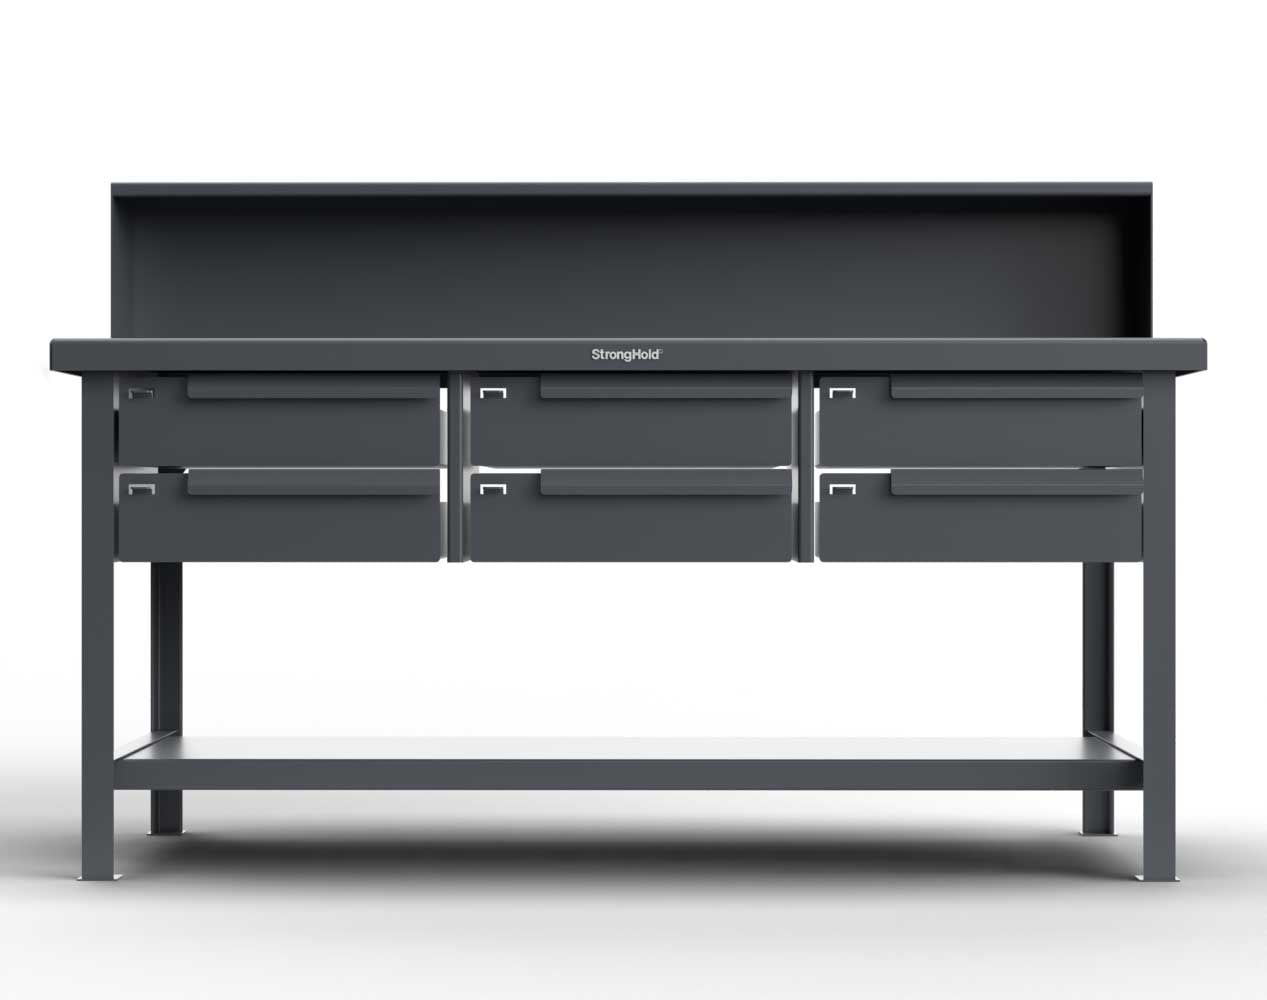 Extra Heavy Duty 7 GA Shop Table with 6 Drawers, 1 Shelf, Riser Shelf – 72 In. W x 36 In. D x 34 In. H